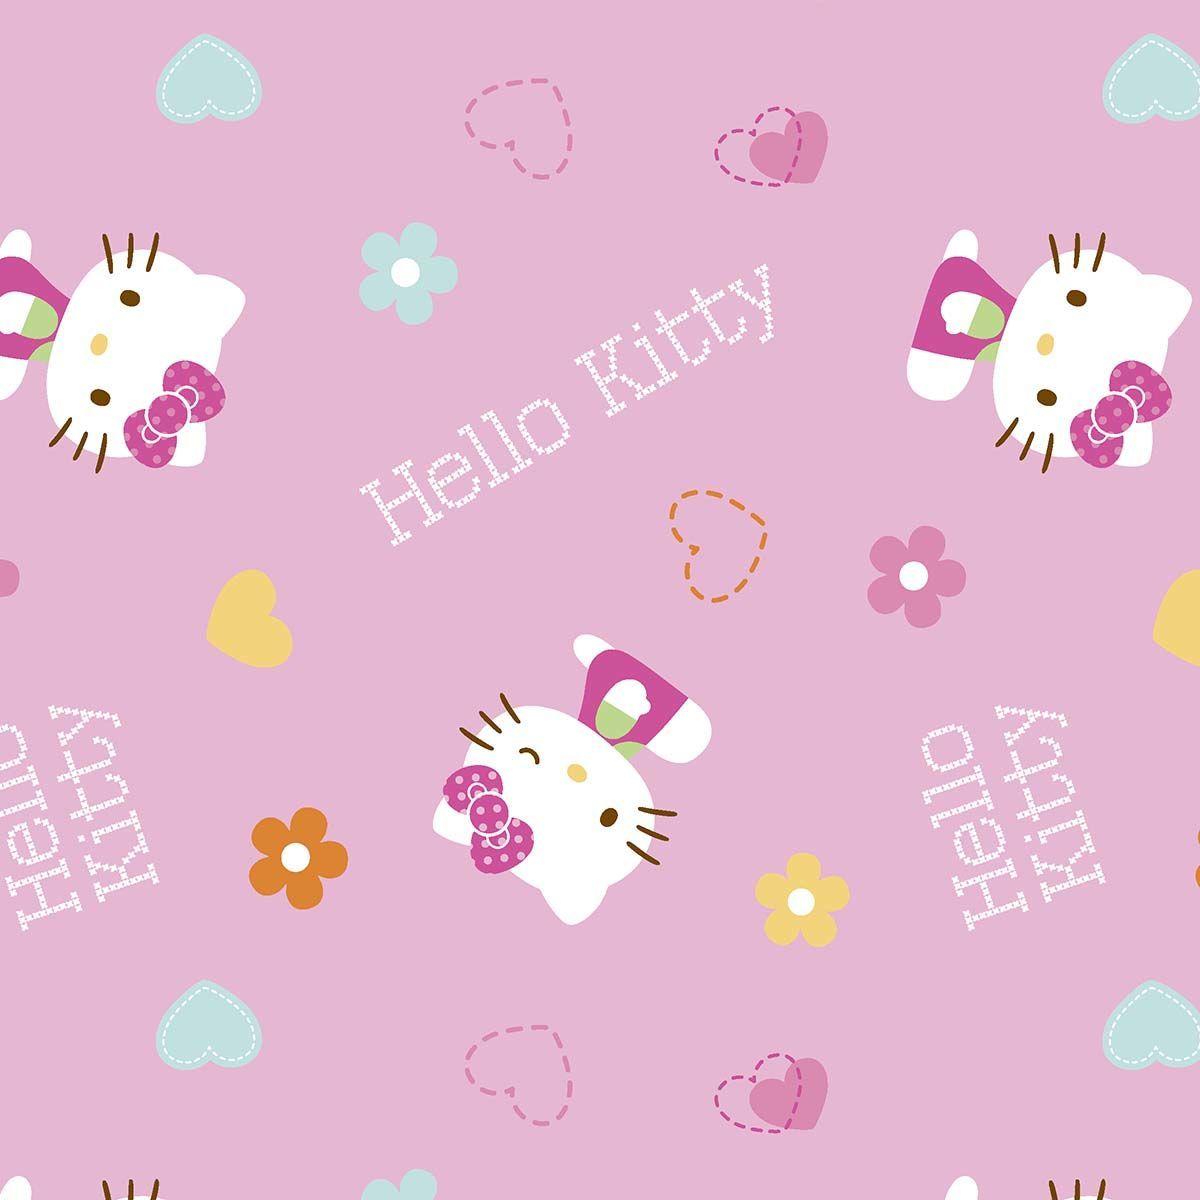 Great Wallpaper Hello Kitty Heart - d253c49bd5331e05baa8d4dc0f0a10a4  Collection_396082.jpg